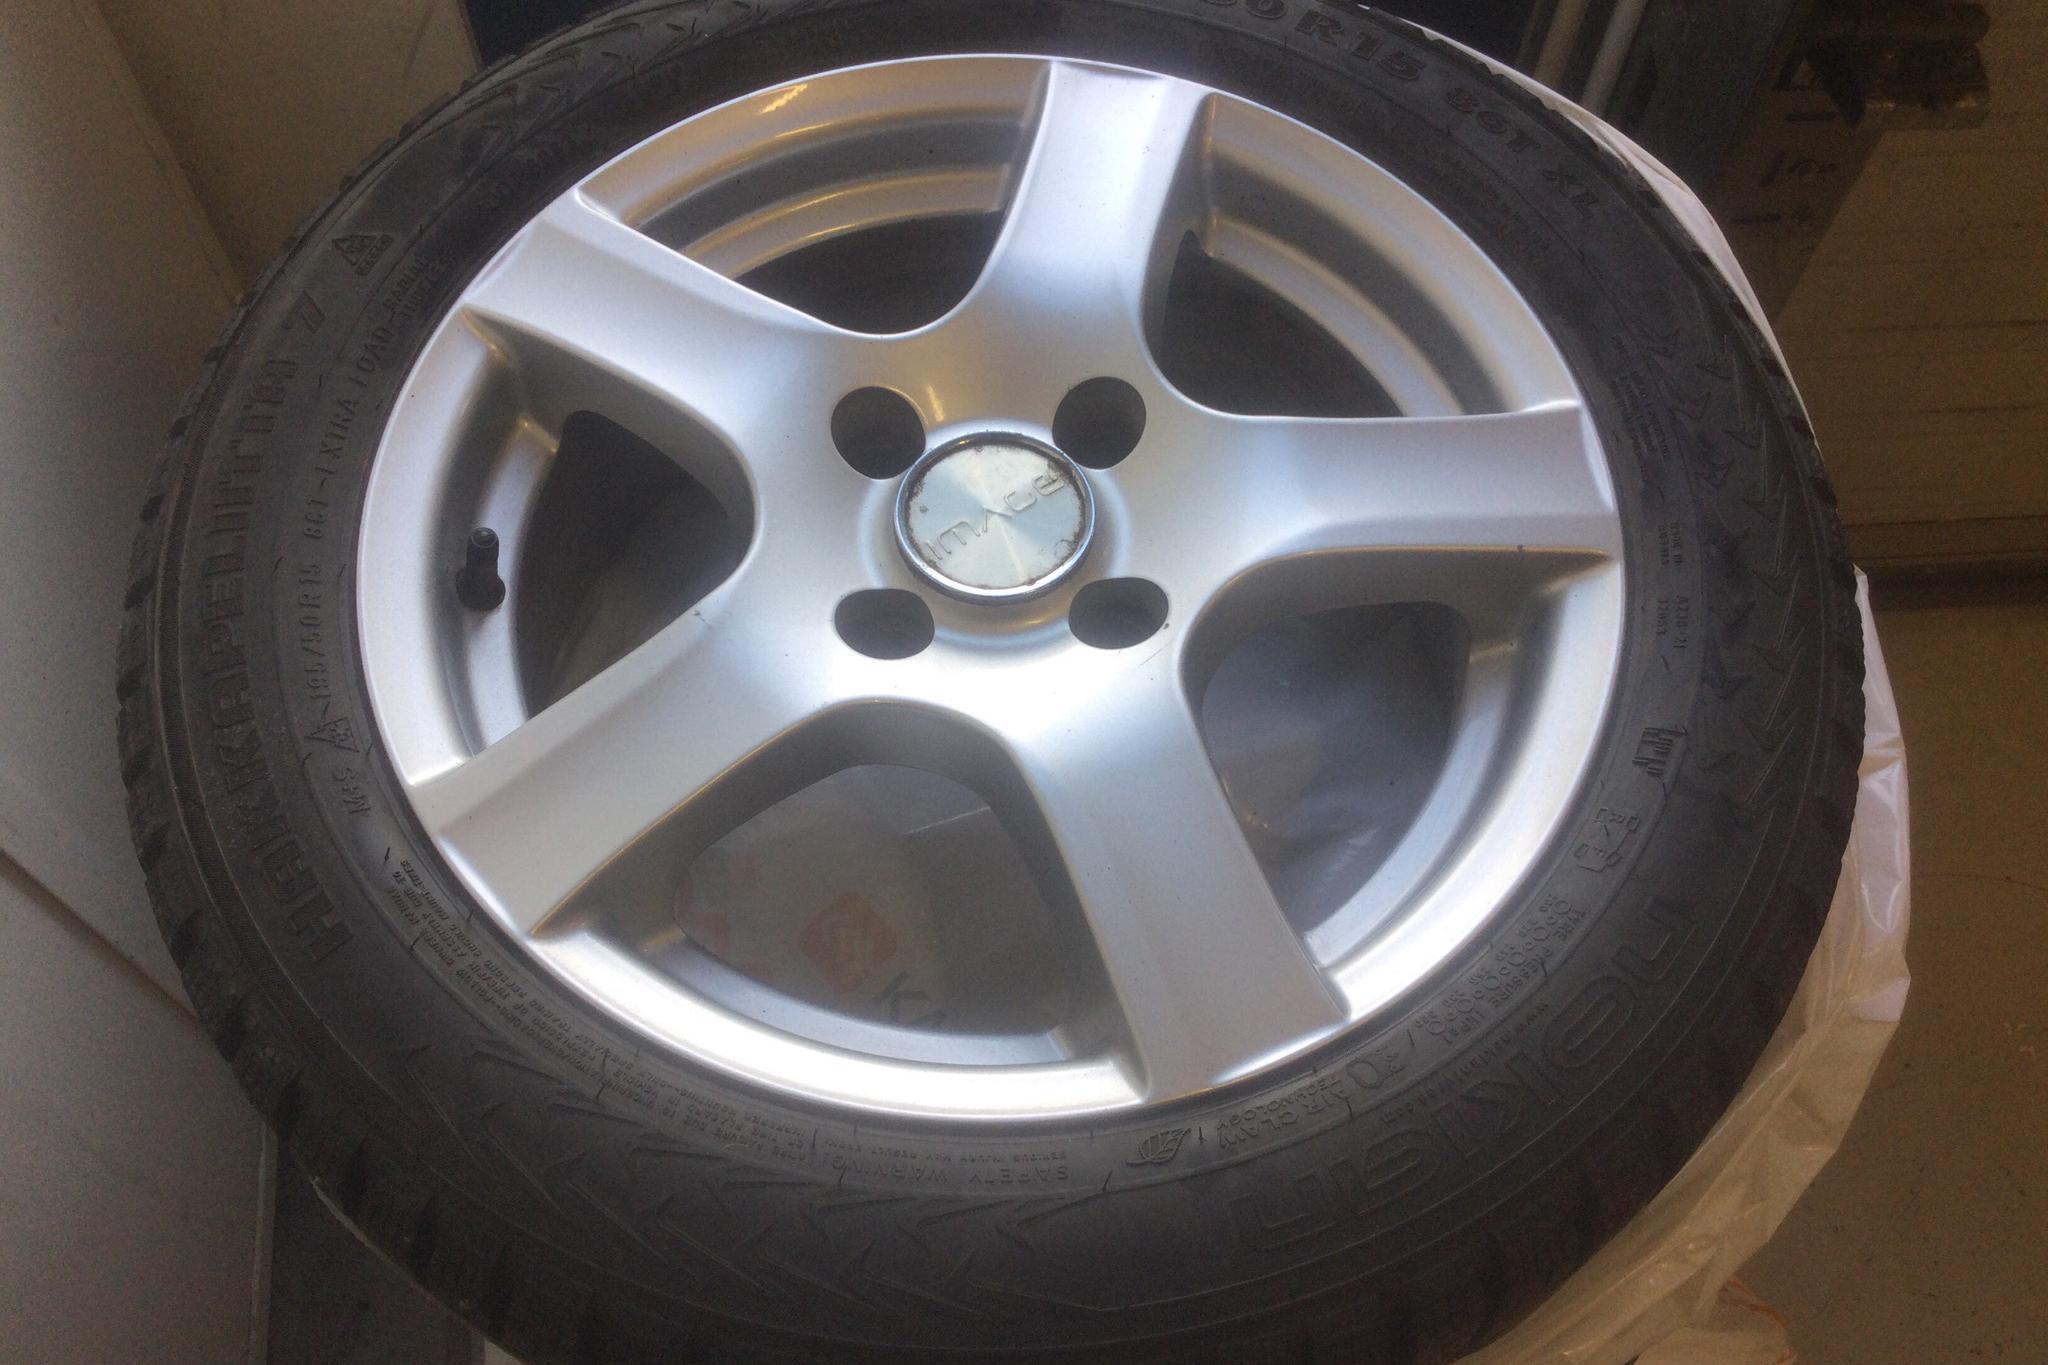 Ford Fiesta 1.0 5dr (80hk) - 47 480 km - Manual - red - 2015